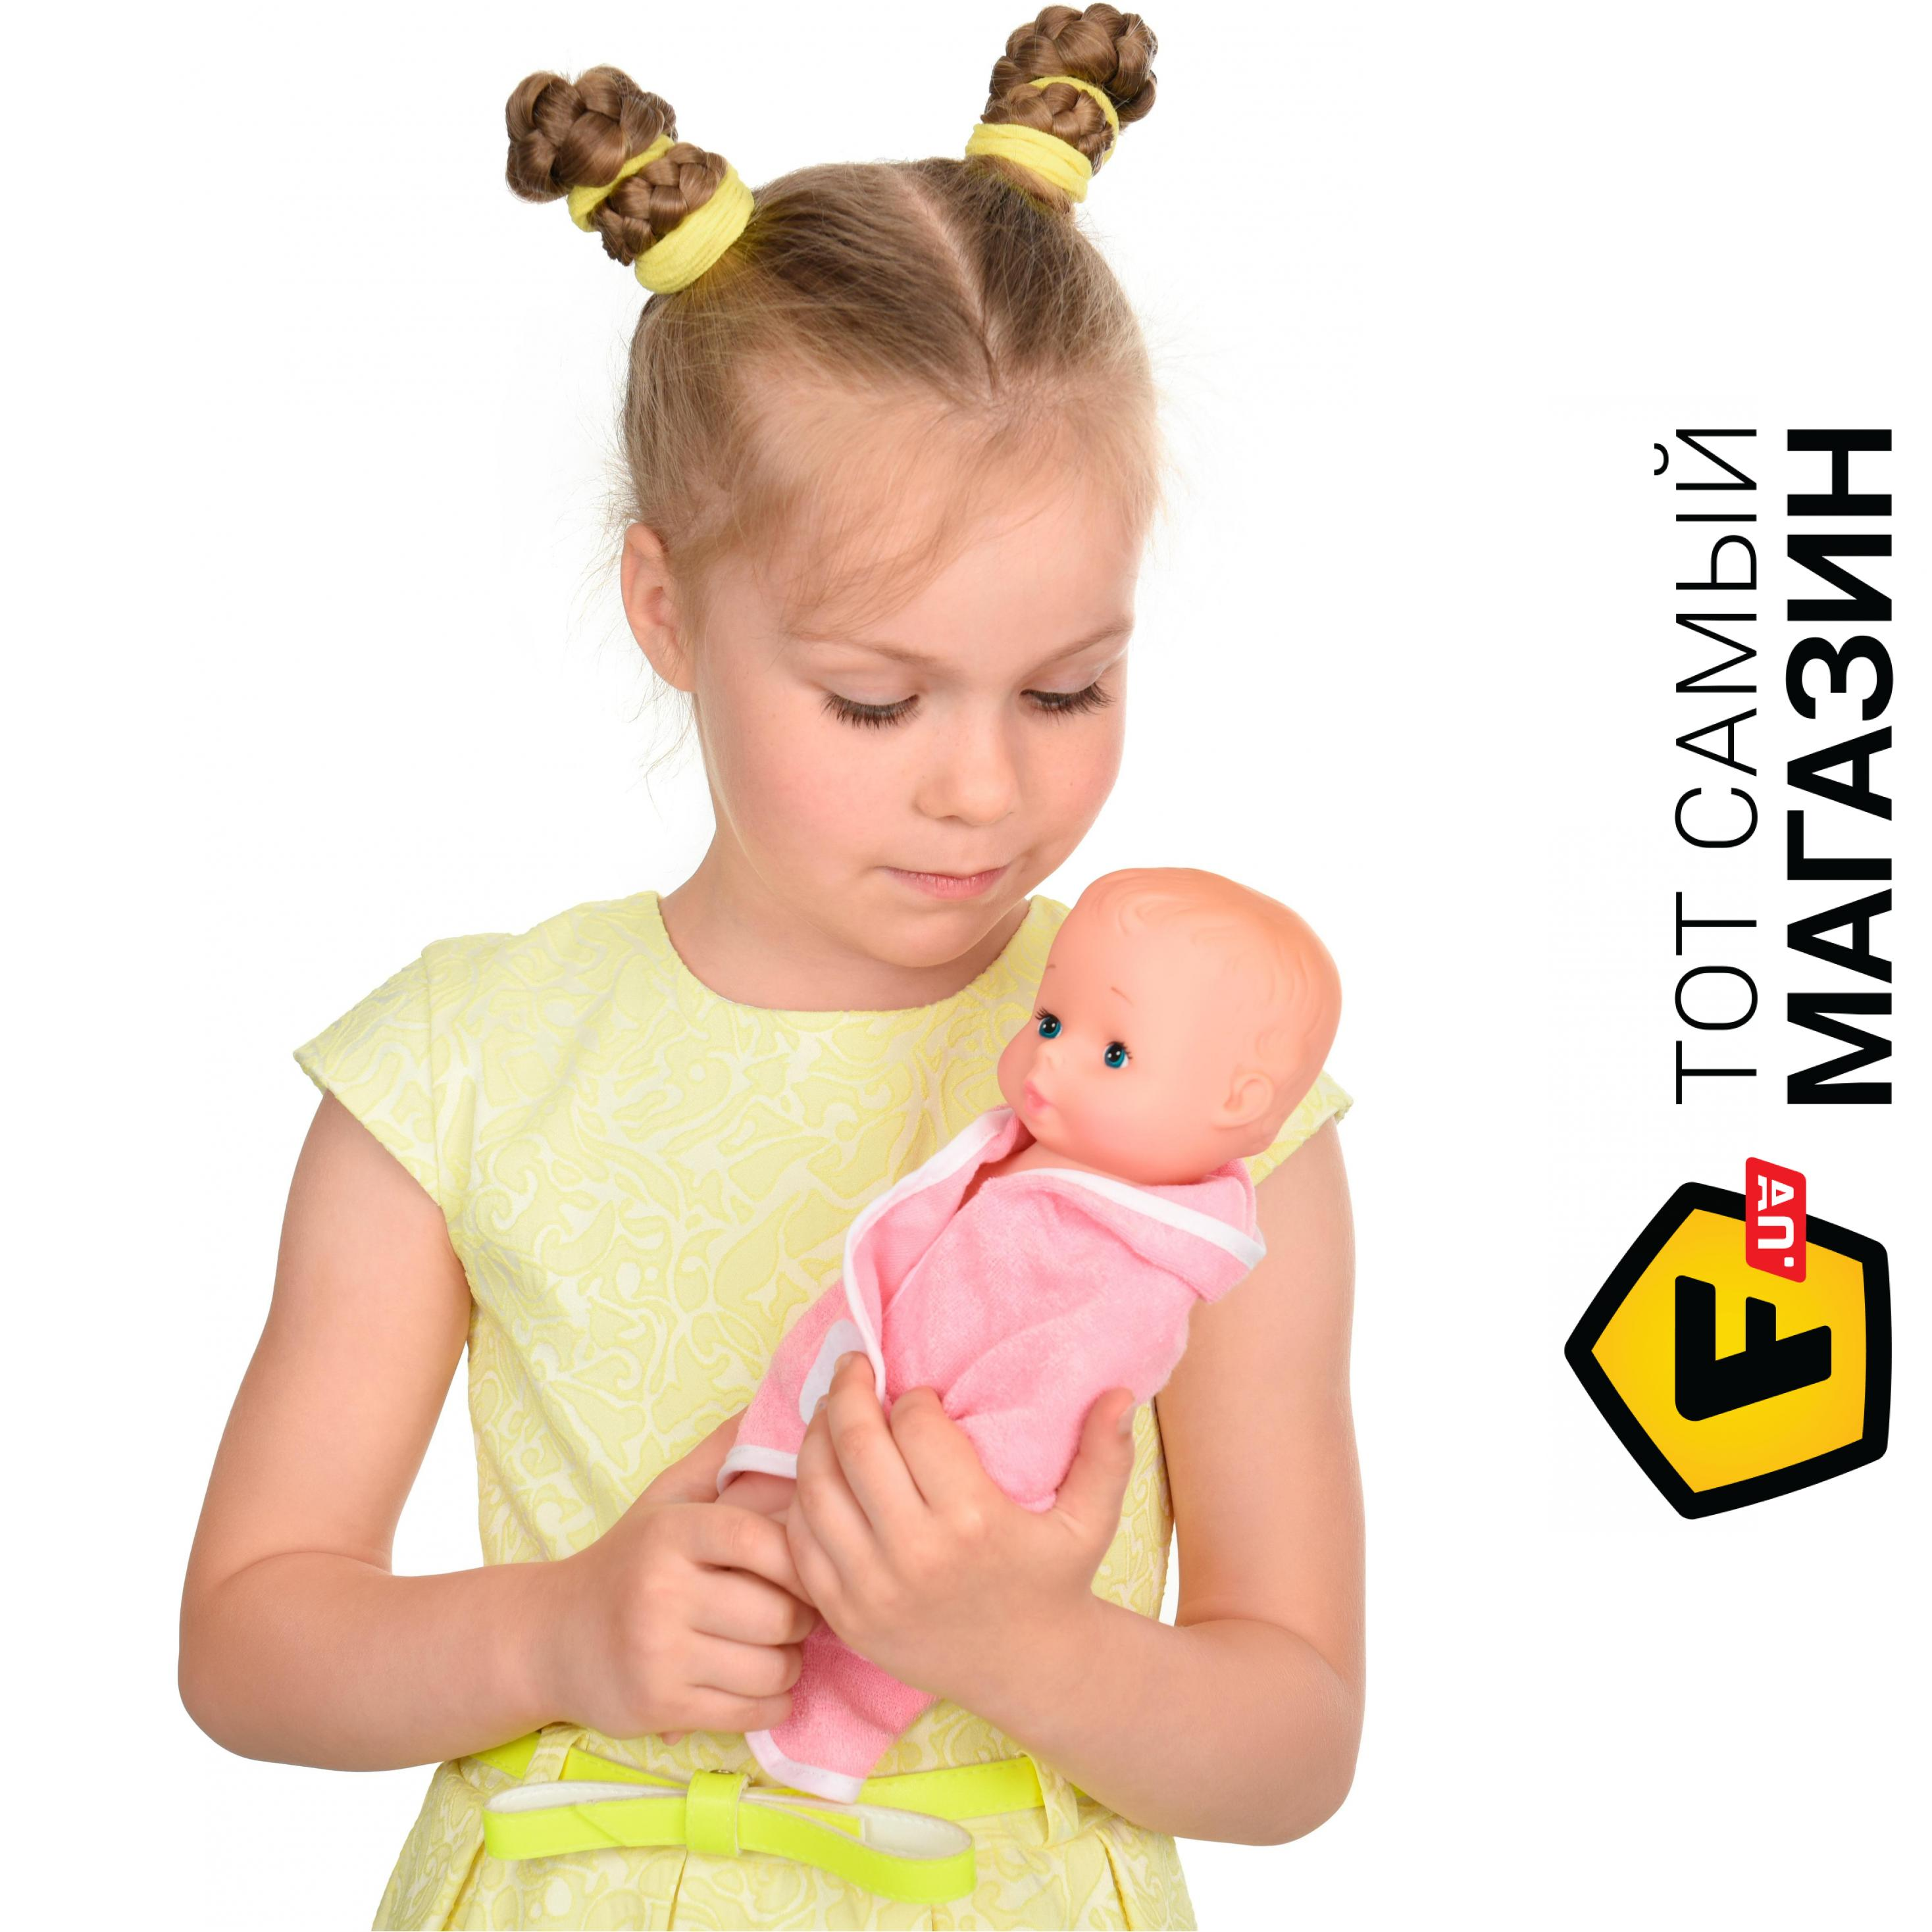 Детские подгузники цена w w1 classic softtronic